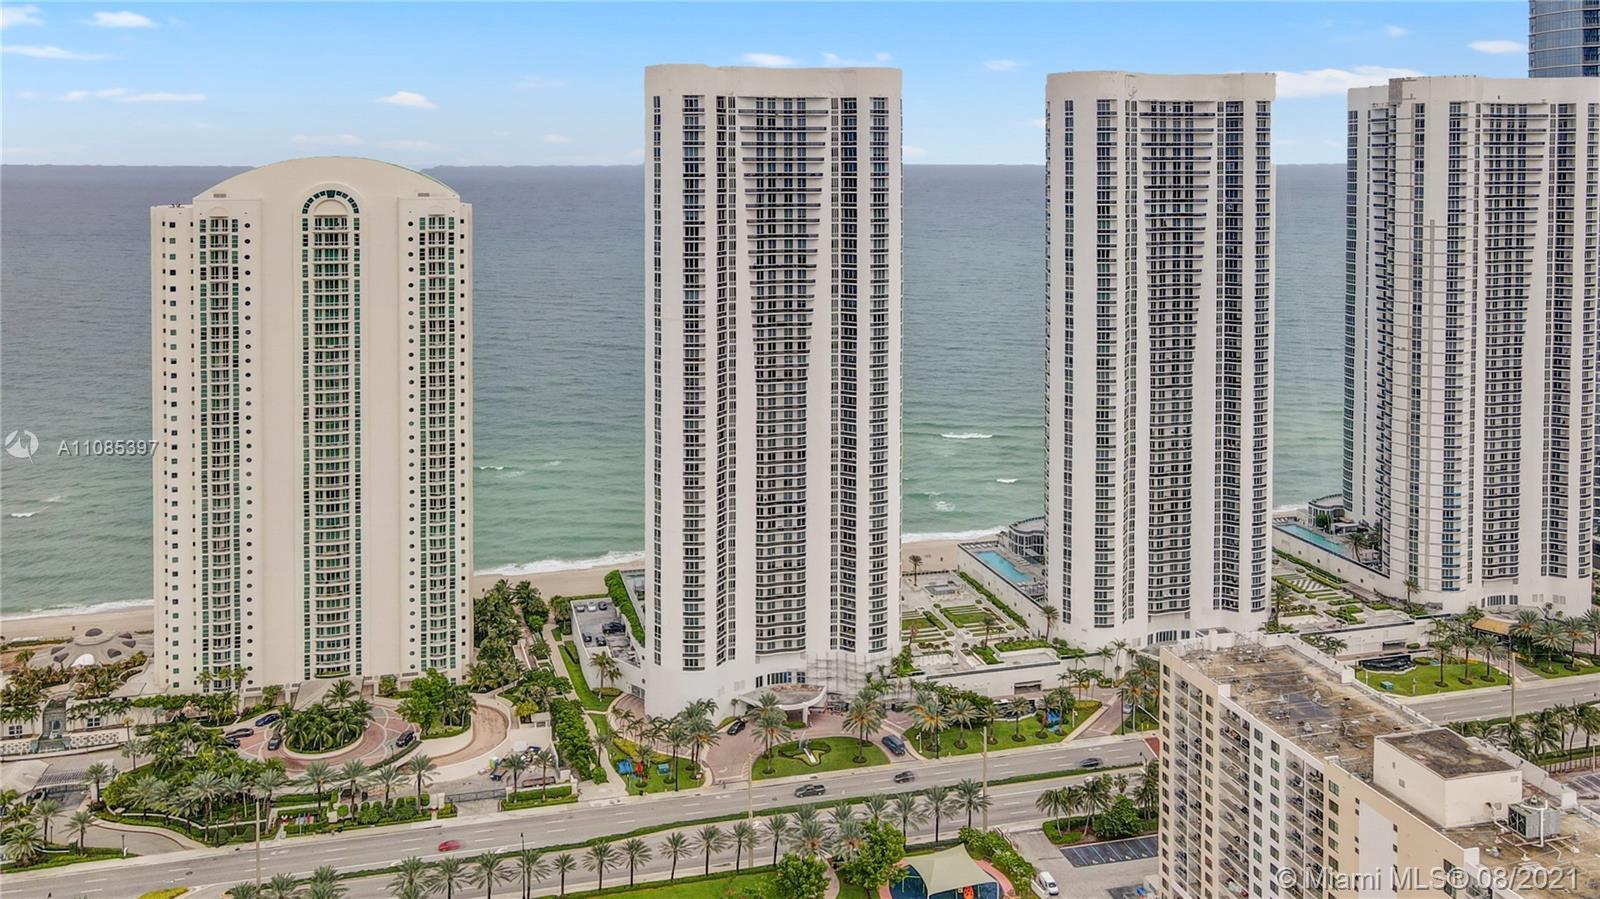 Trump Tower I #1703 - 16001 Collins Ave #1703, Sunny Isles Beach, FL 33160